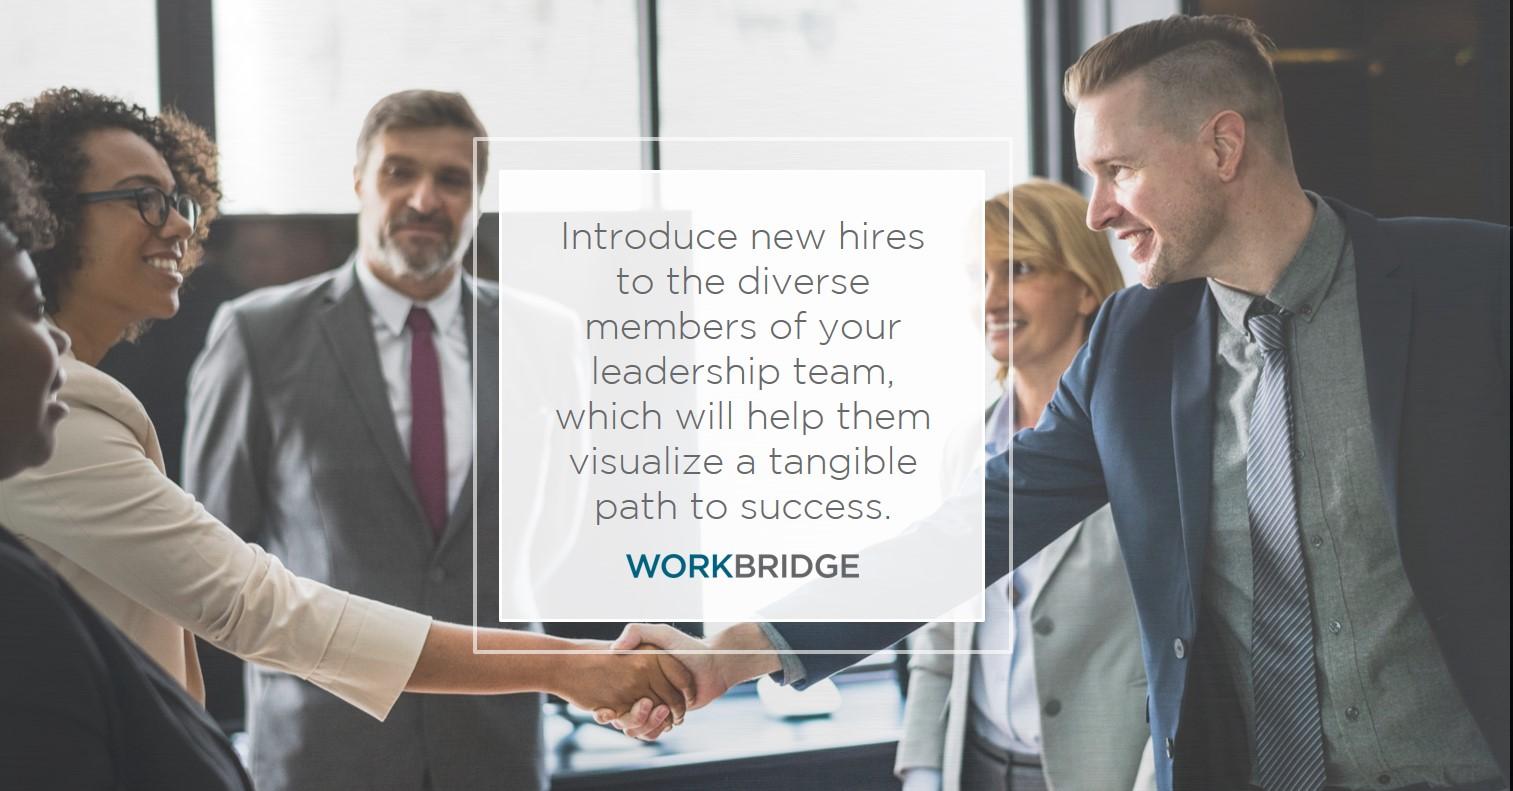 career-success, diverse-leadership, diverse-hiring, tech-career, workbridge-associates